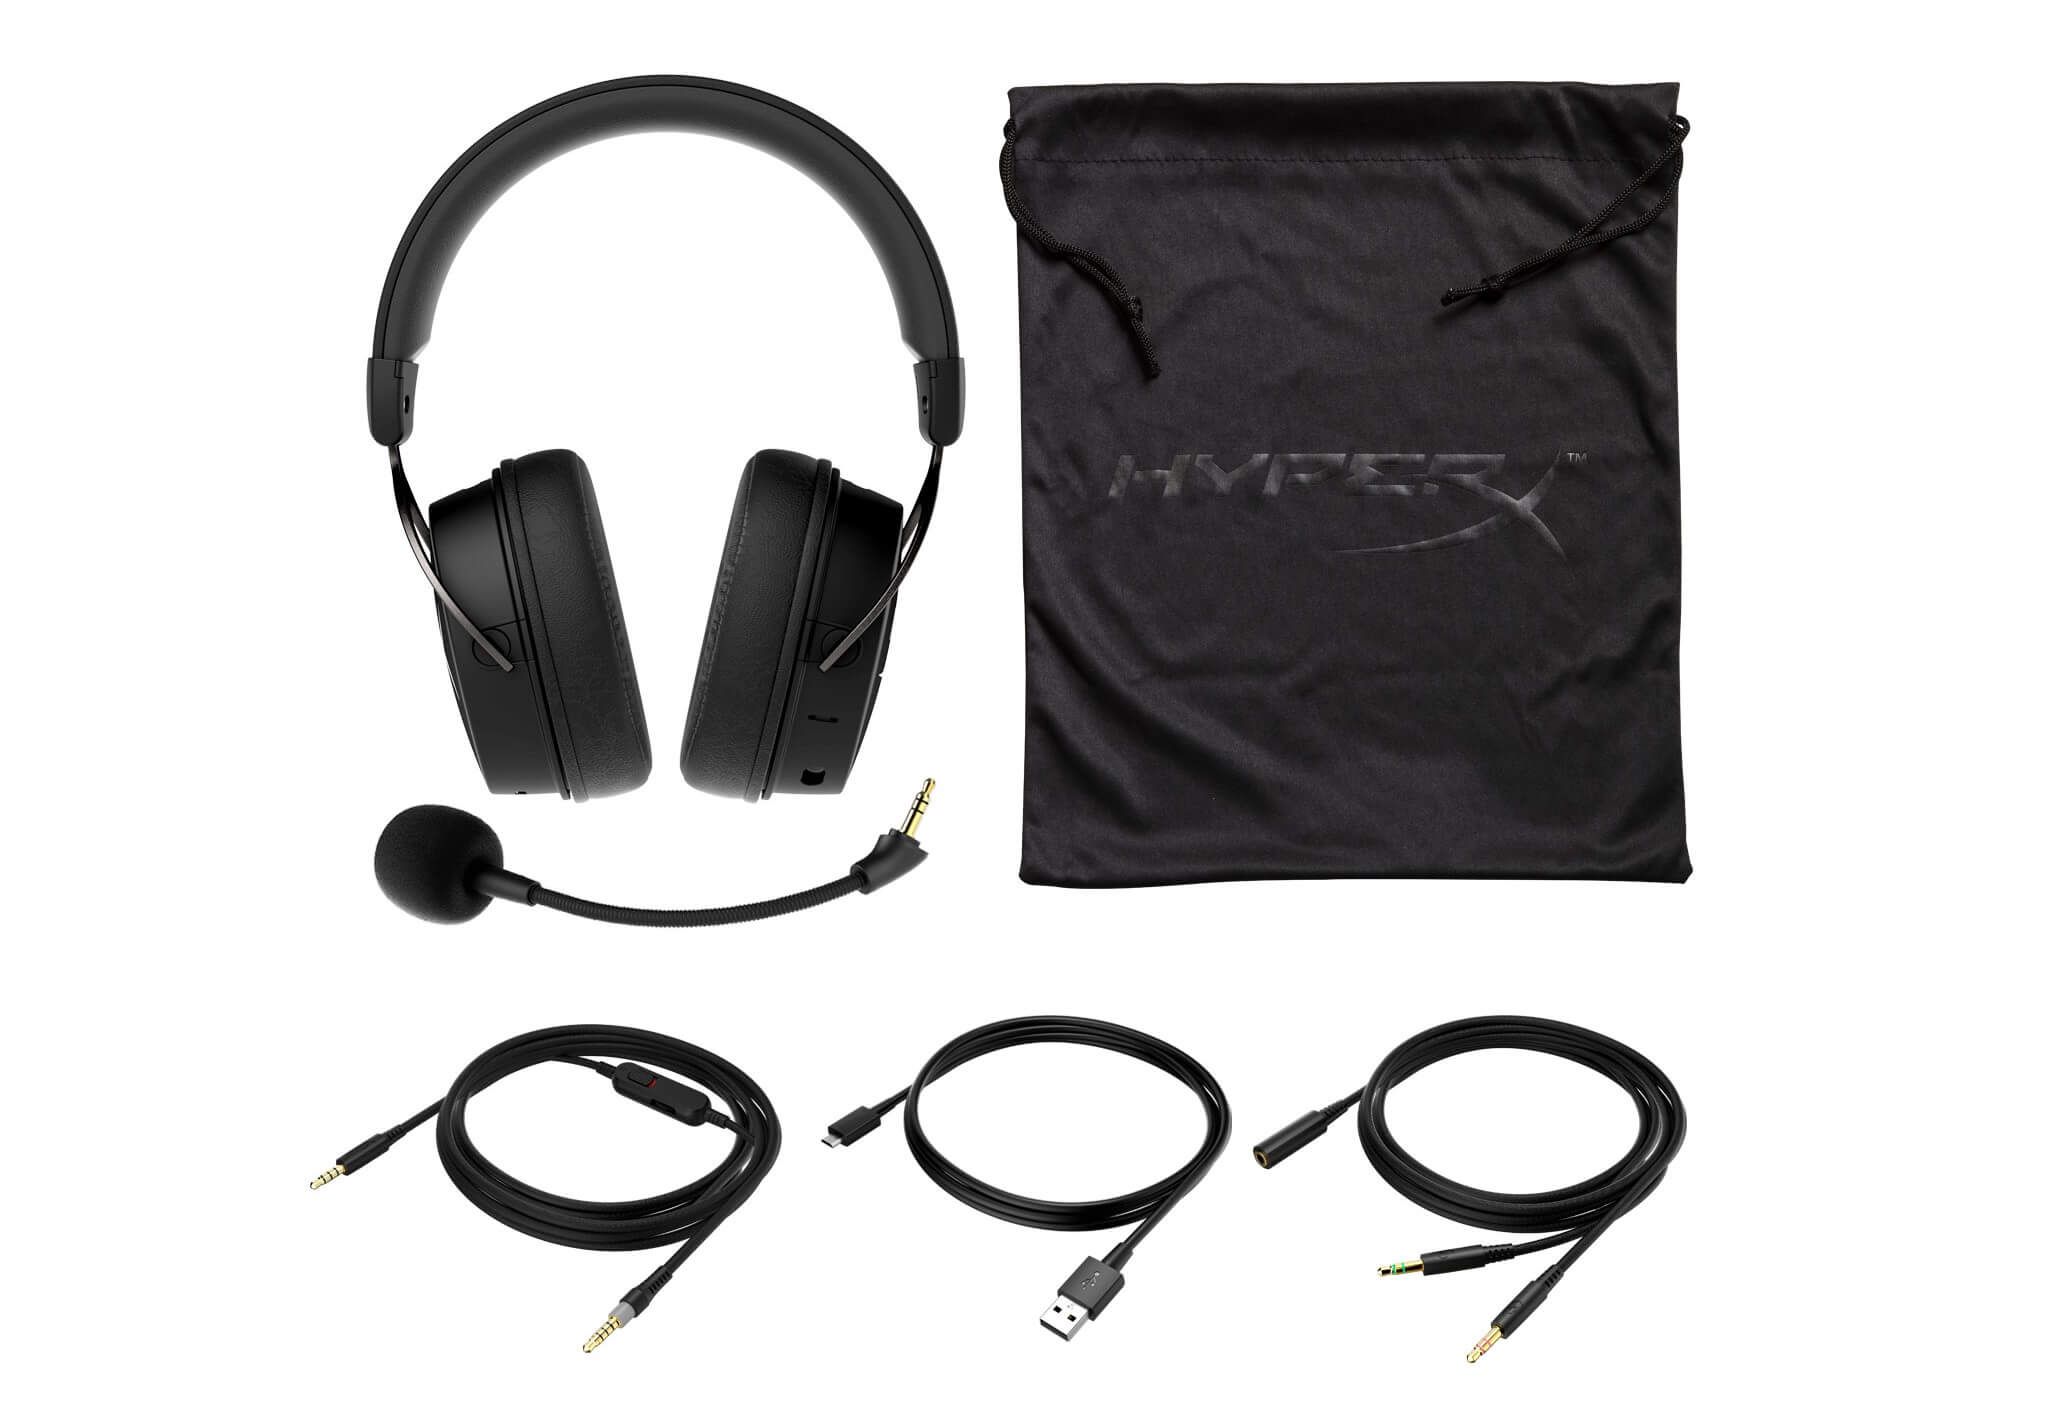 HyperX Cloud Mix - 01